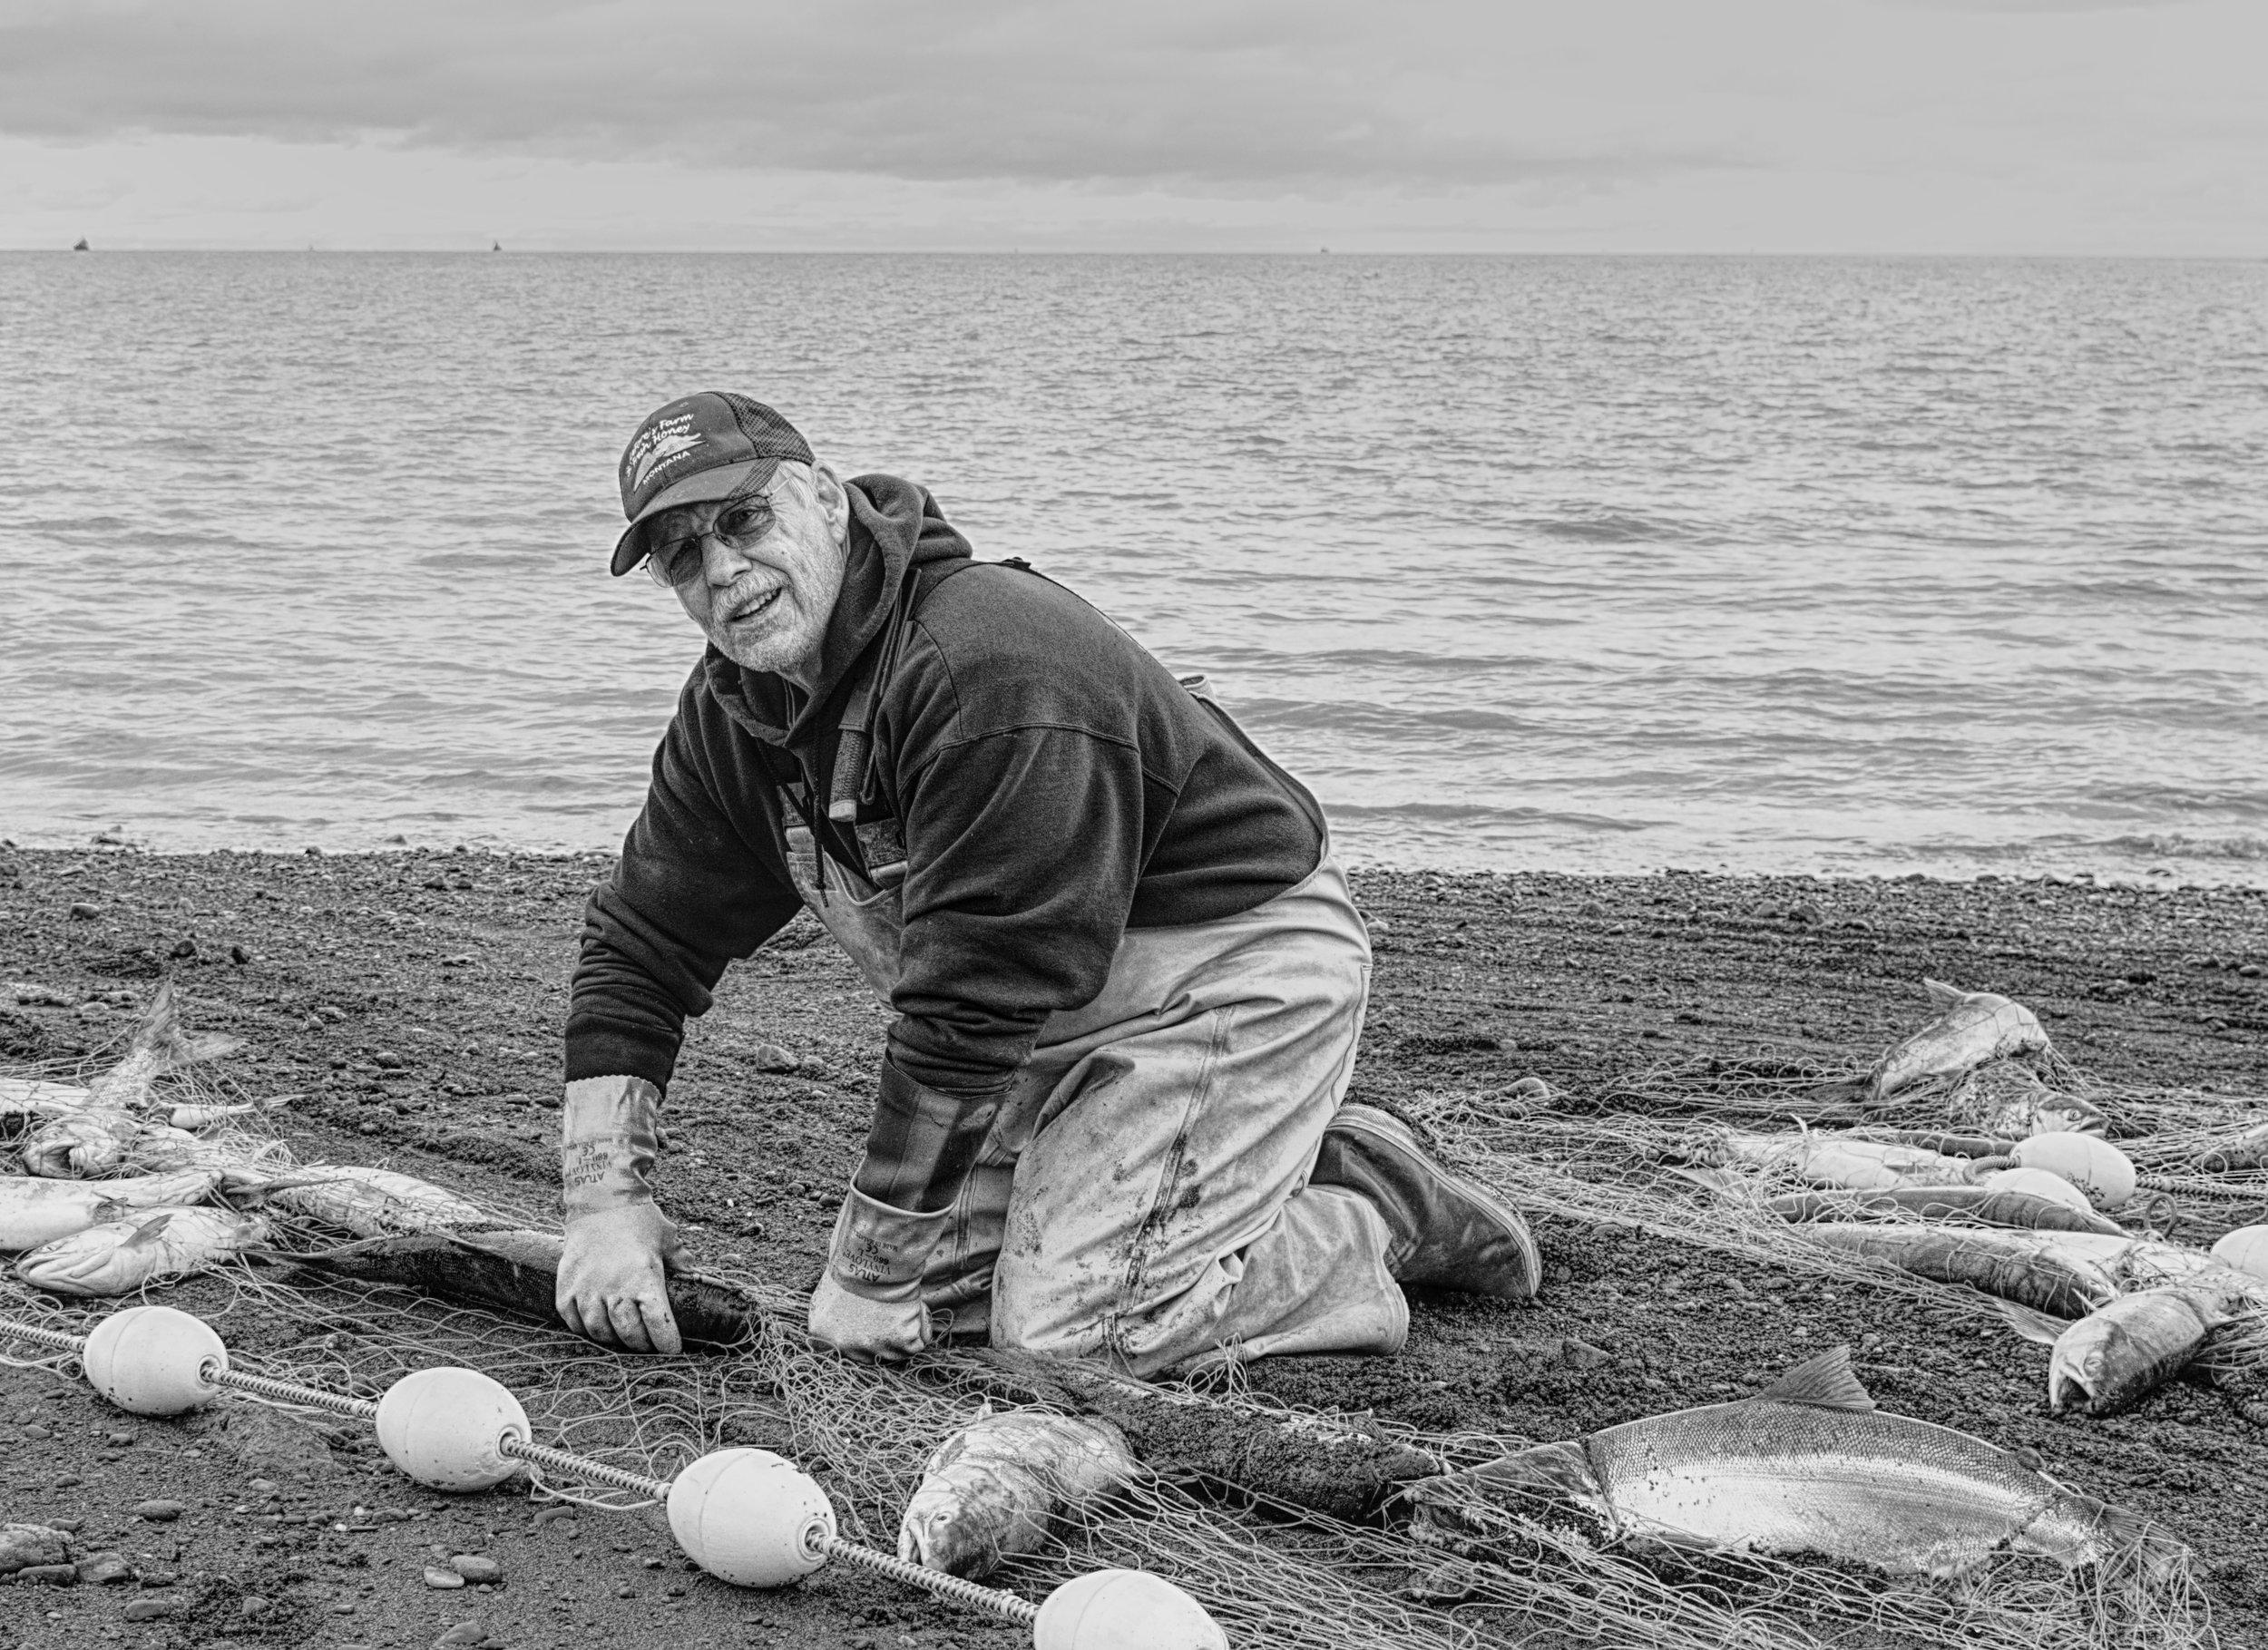 Dave Reynolds - Fishing since 1980